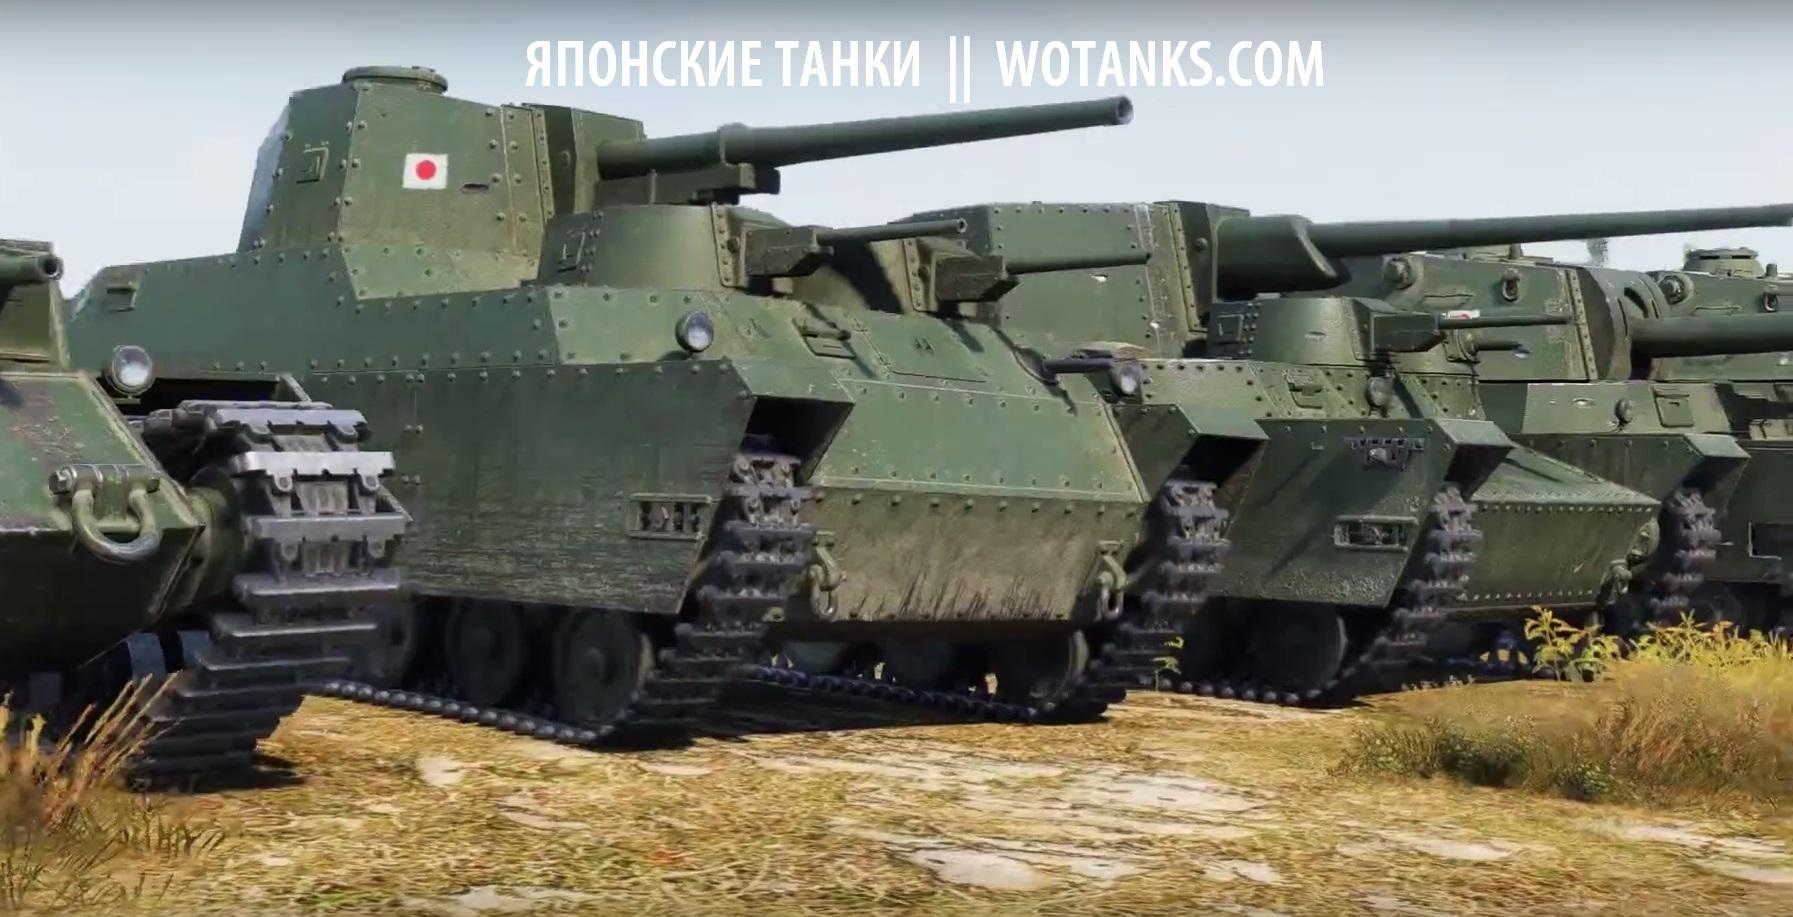 Японские танки в патче 0.9.10